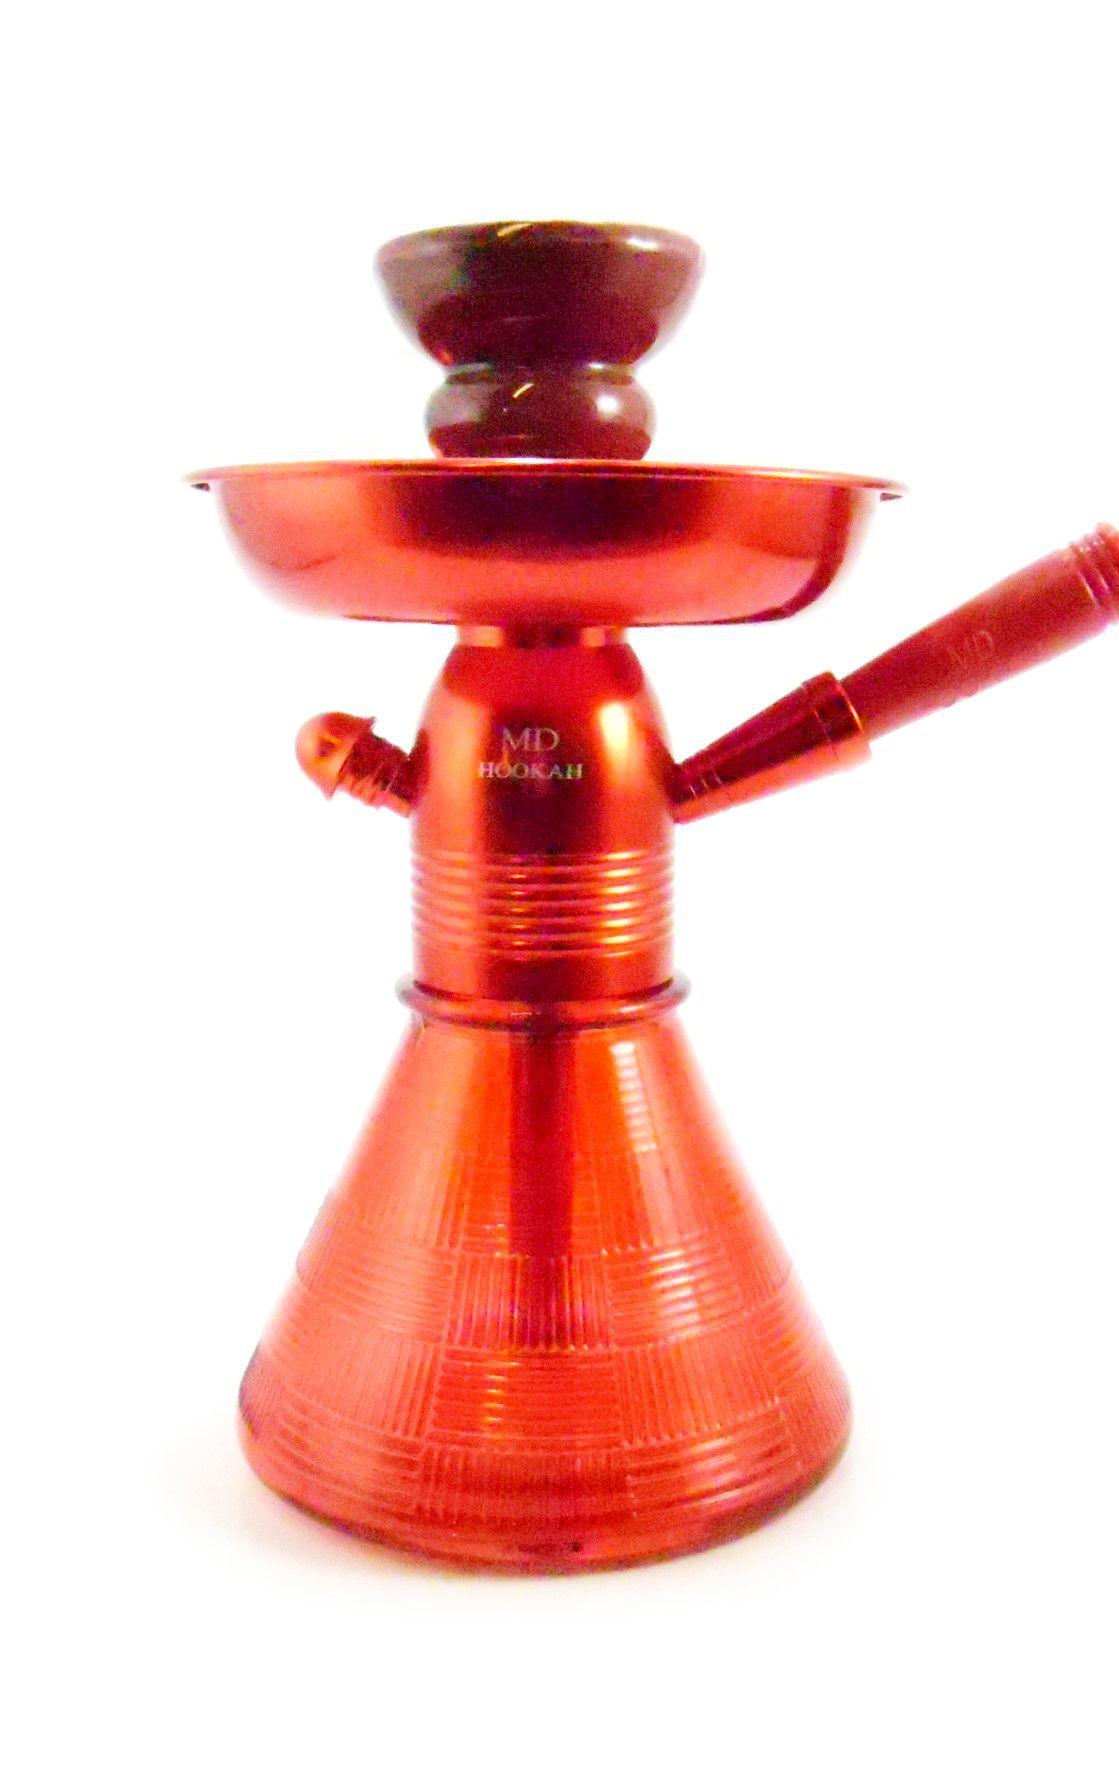 Narguile MD Hookah PETIT 23cm. Corpo alumínio anodizado, vaso base larga VERMELHO, mangueira lavável